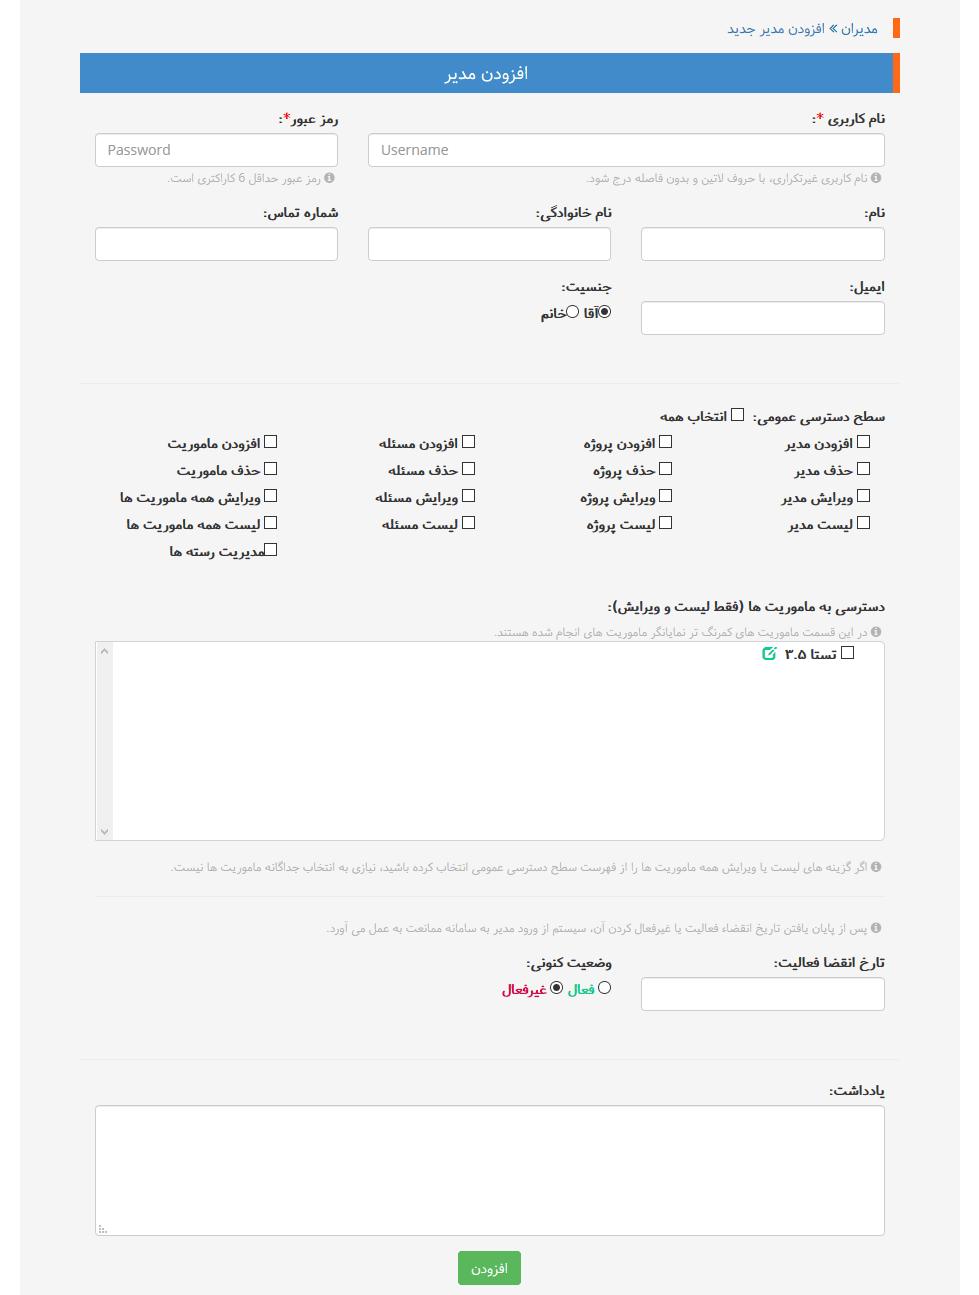 https://proja.aftab.cc/img/screenshot/proja_screenshot_5.png